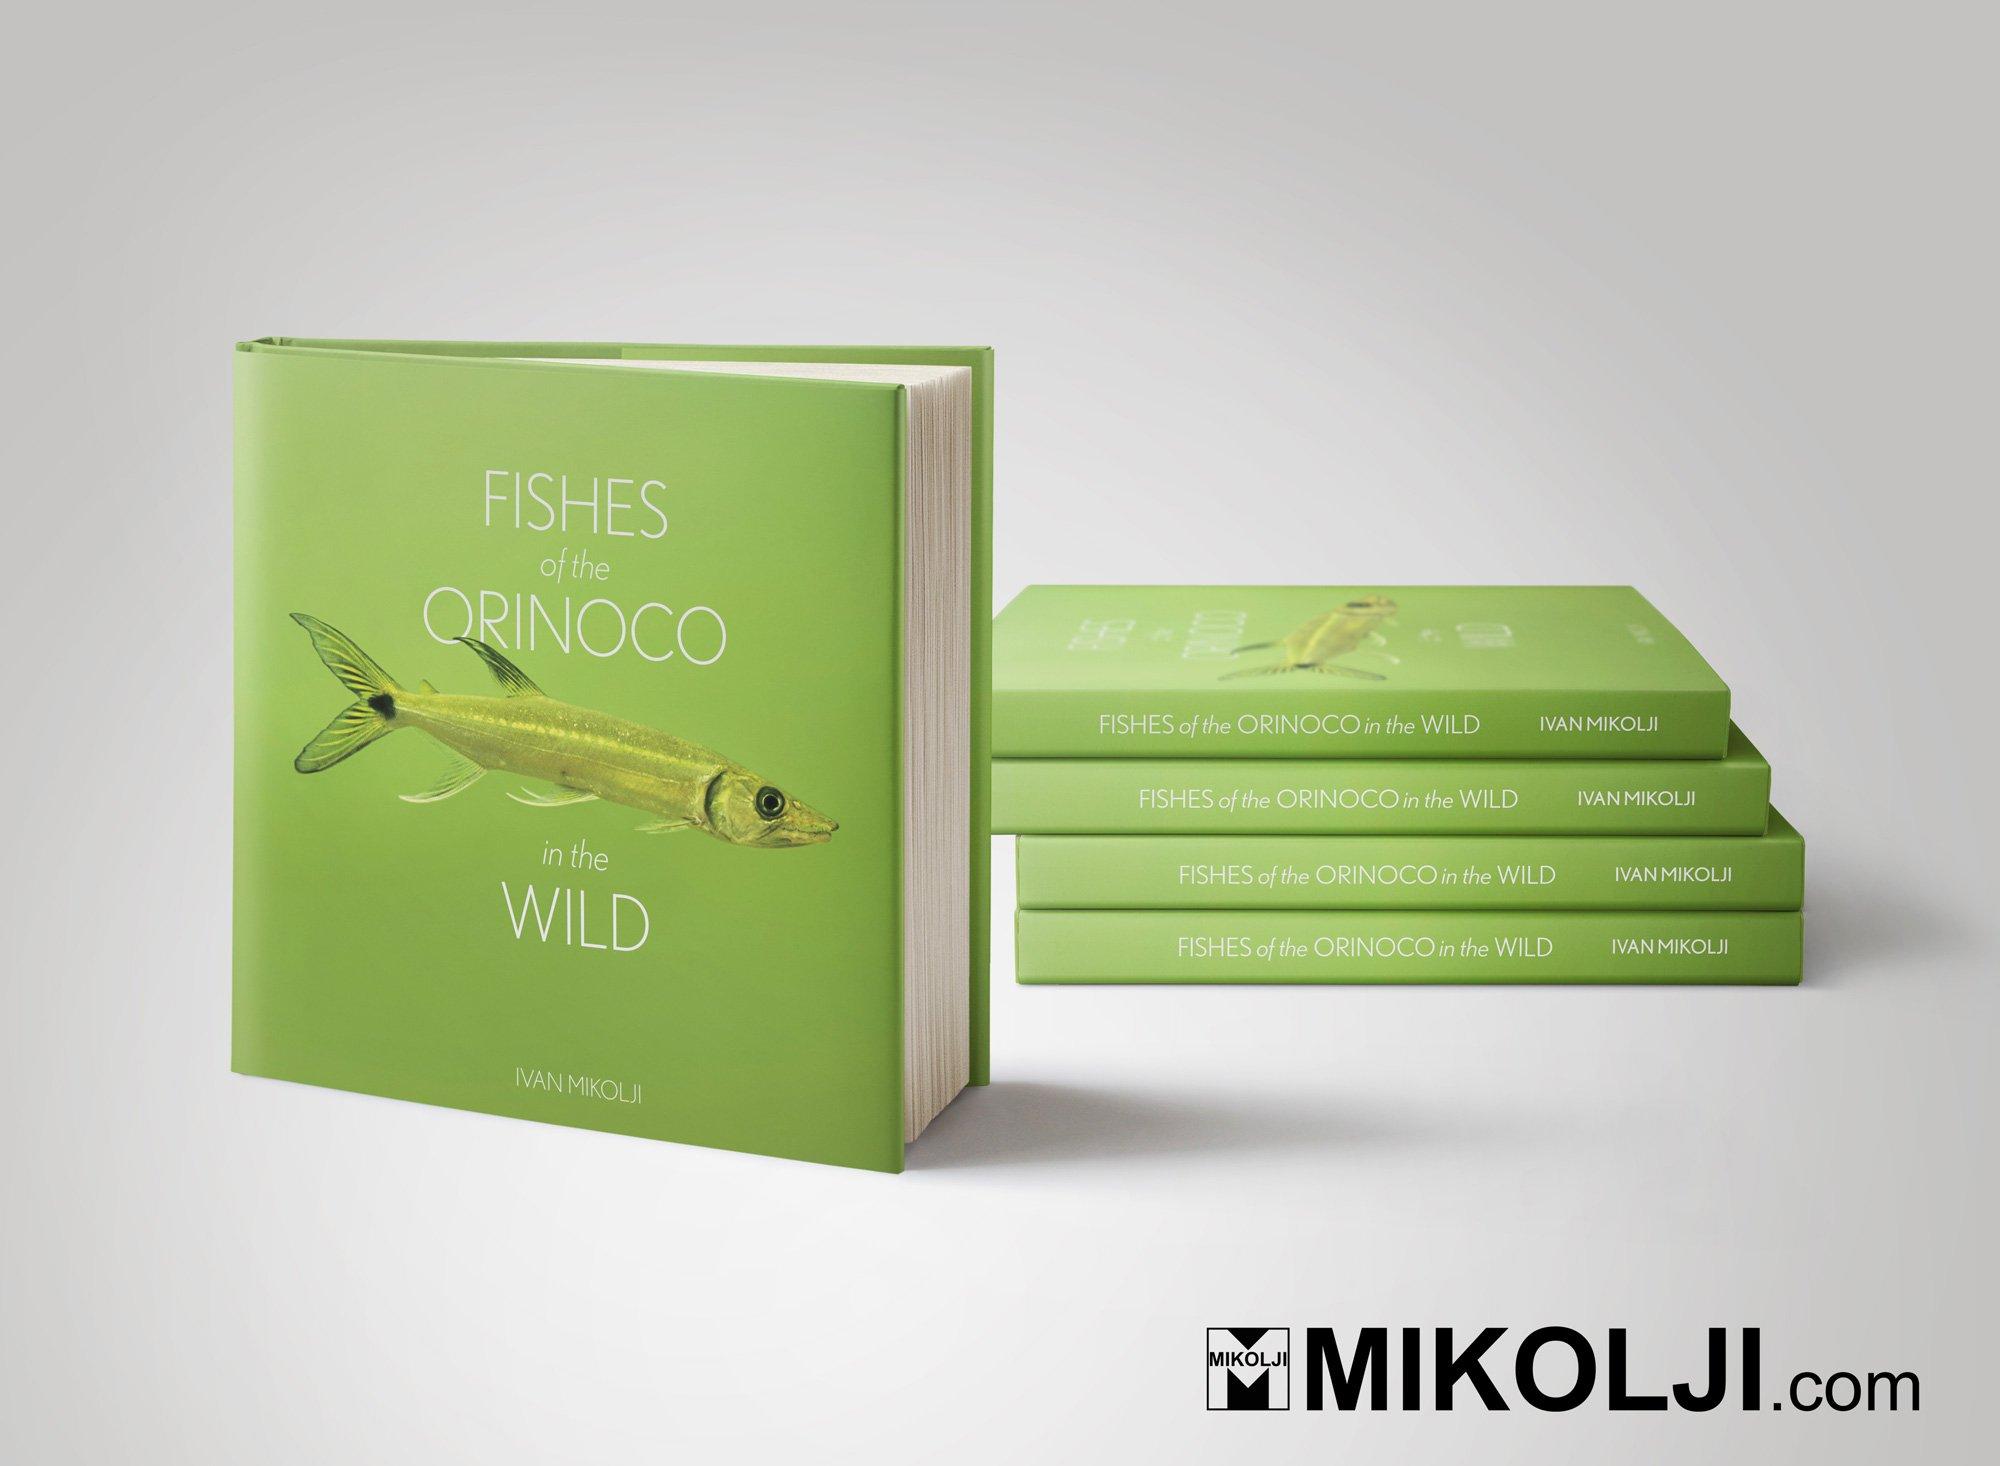 Ya llegó el nuevo libro de Mikolji!